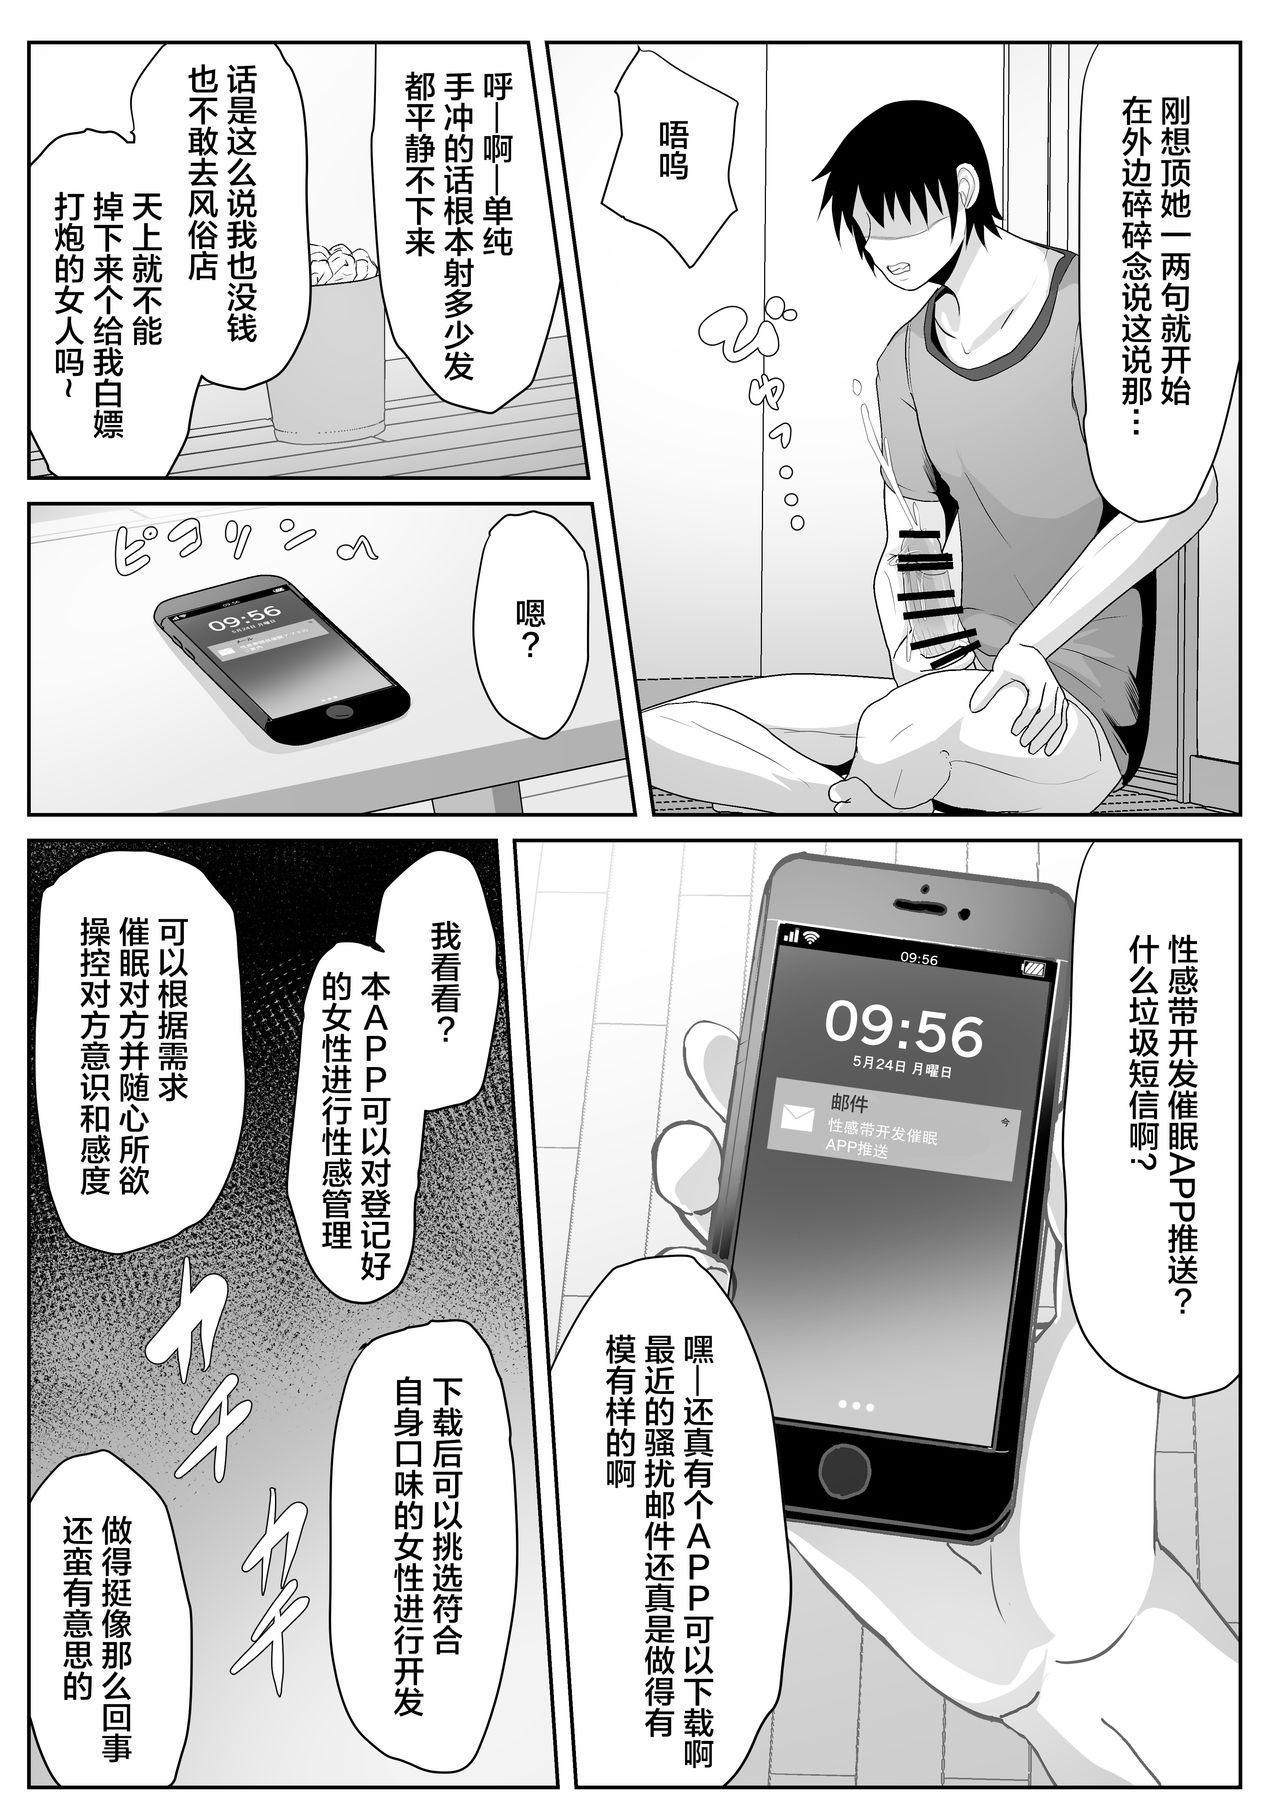 [Akikan] Kaa-san Senyou Saimin Appli[Chinese]【不可视汉化】 5